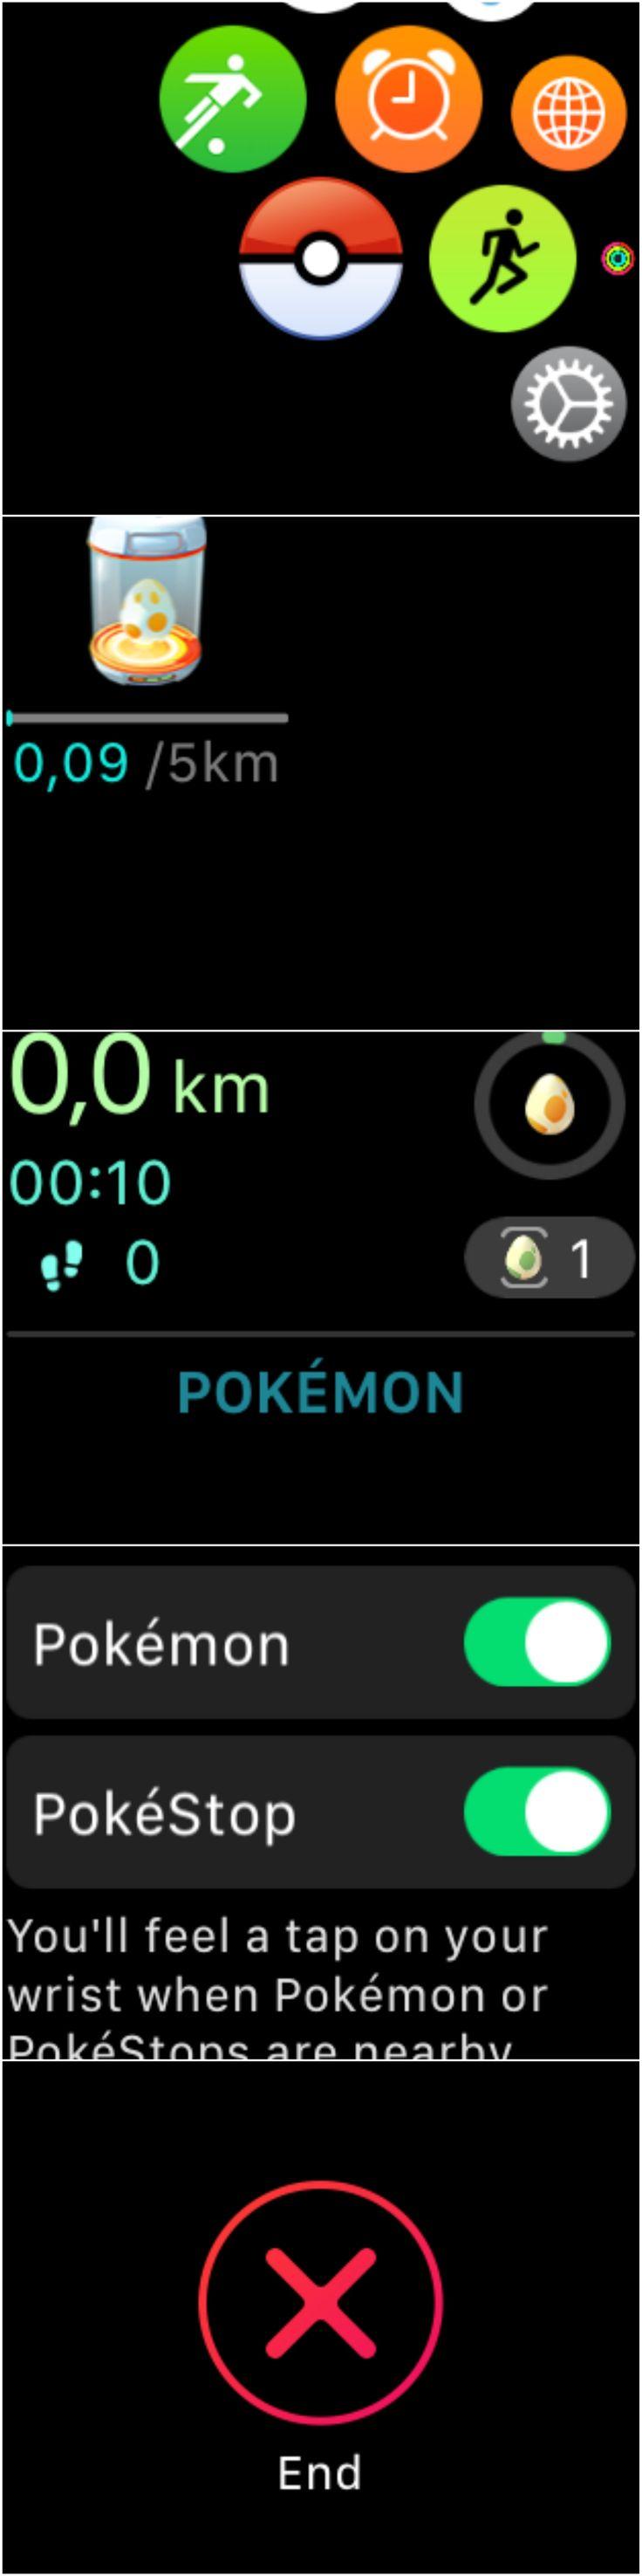 How Pokemon Go looks like on the Apple Watch